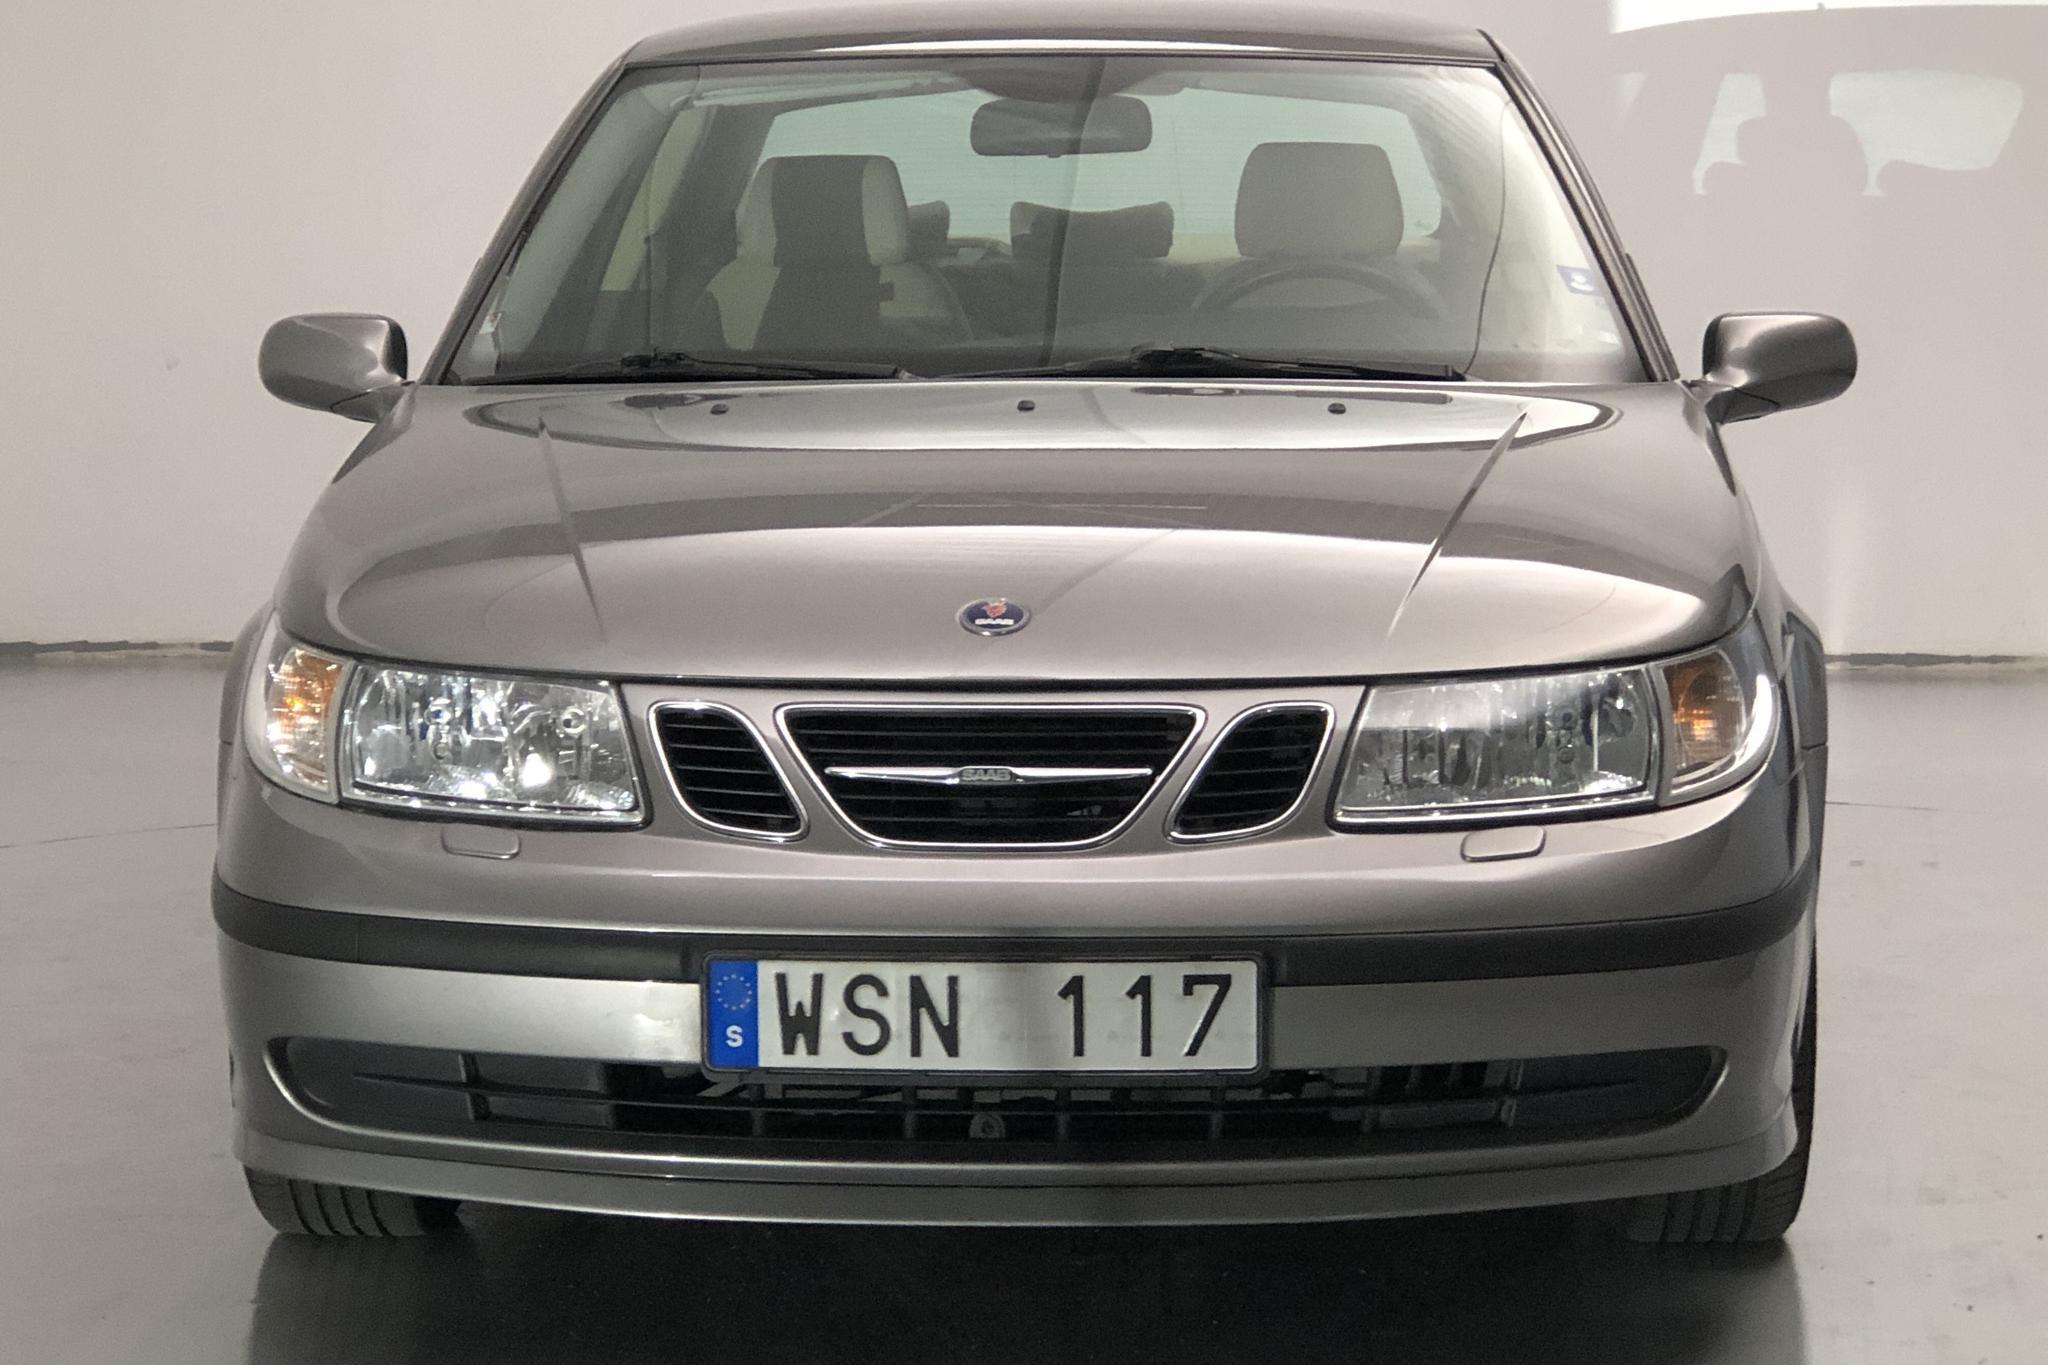 Saab 9-5 2.0t SportSedan (150hk) - 95 380 km - Manual - Light Grey - 2005